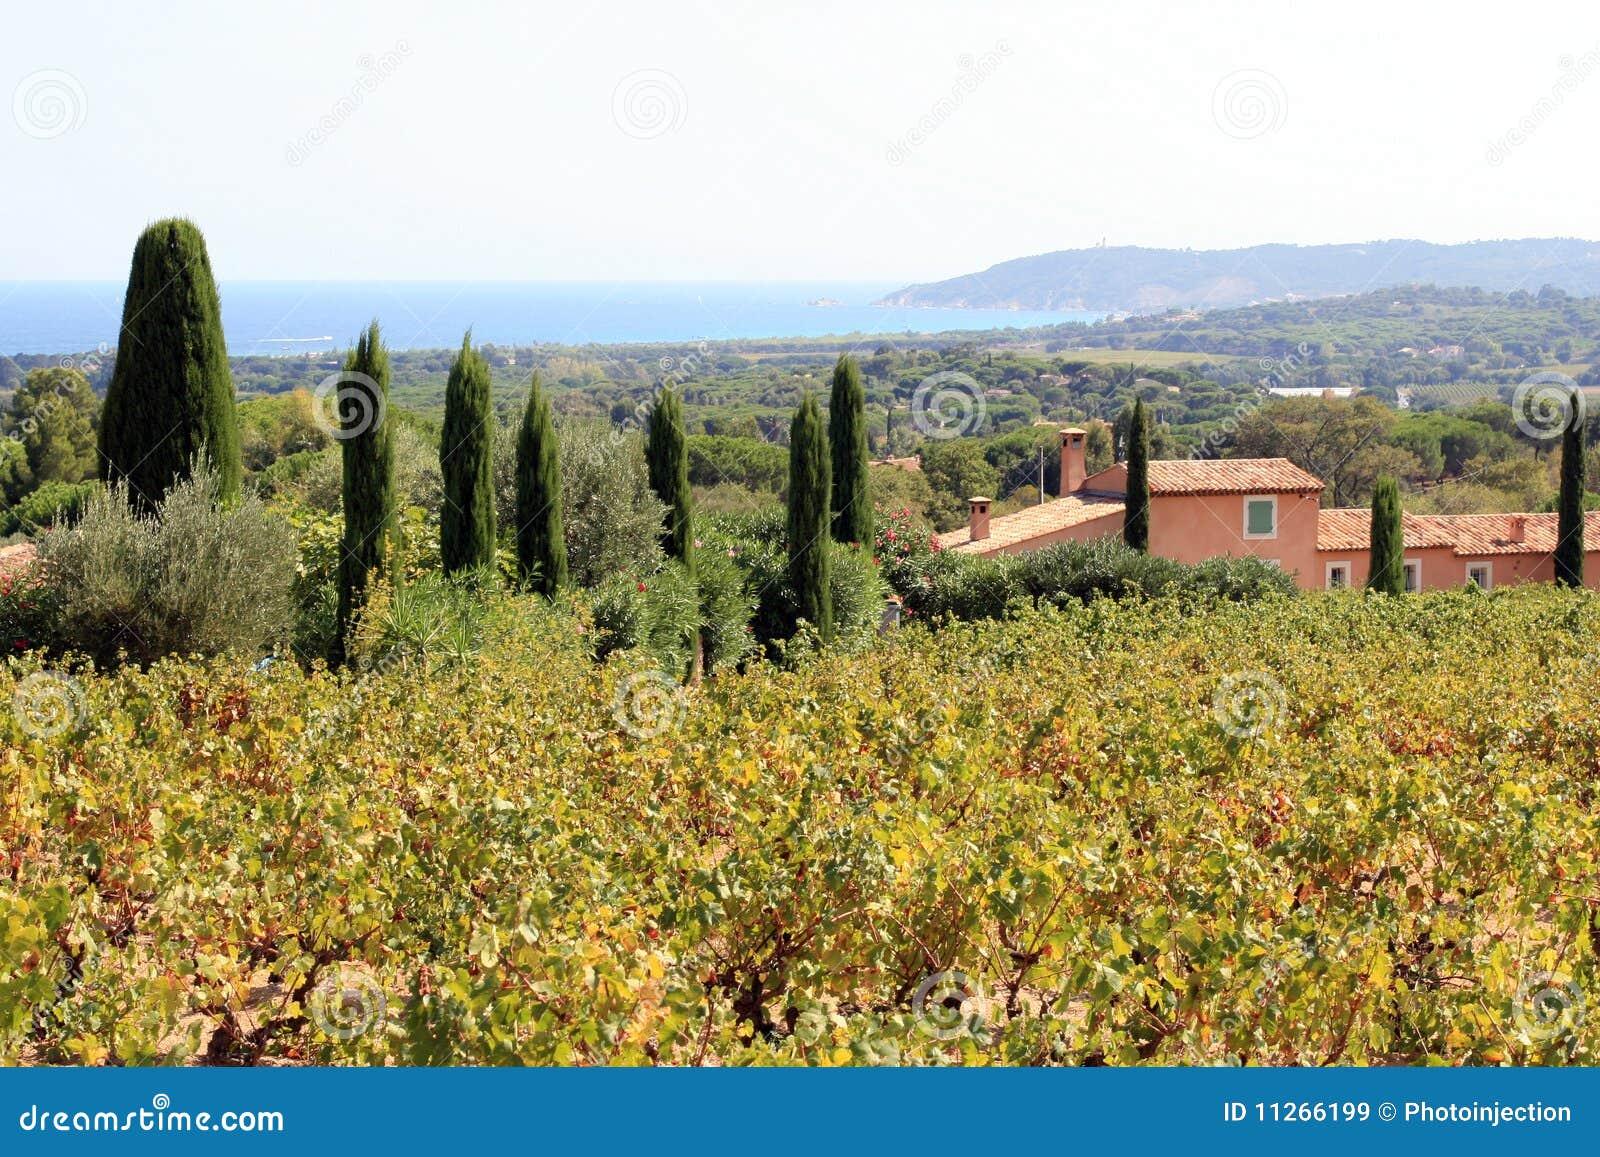 St. Tropez - Provence - France